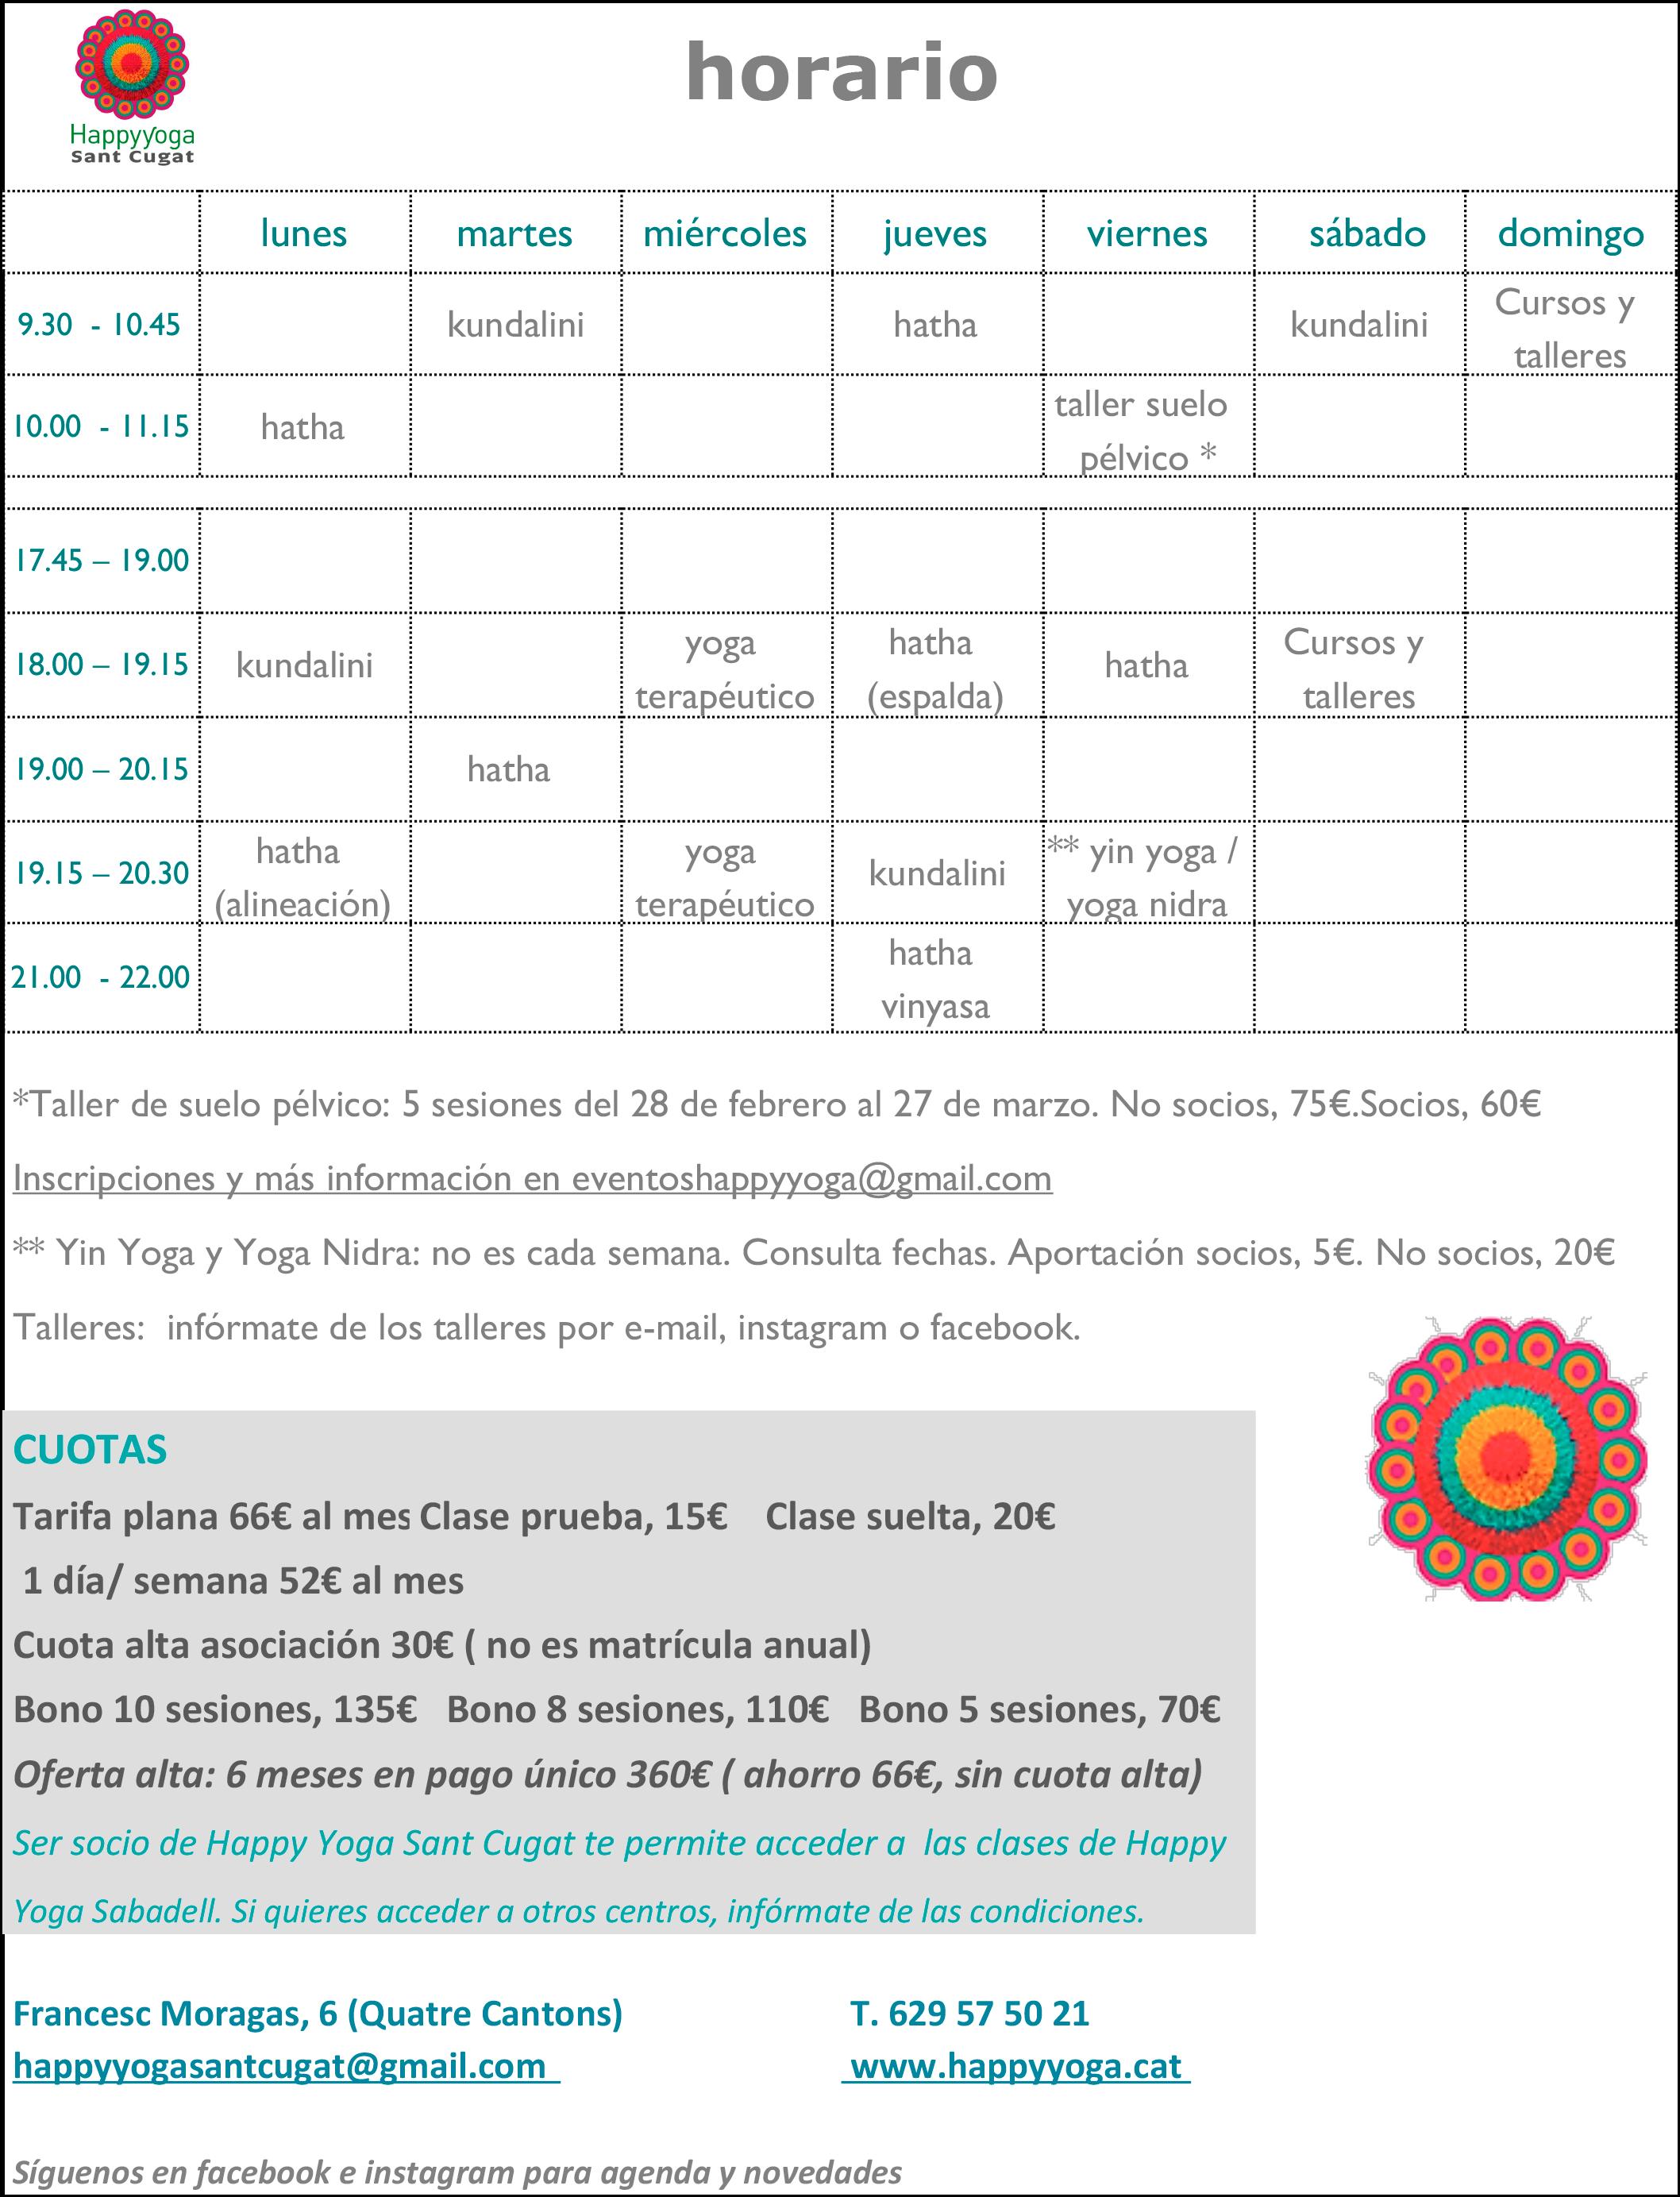 horario curso 2019 - 2020 a partir nov 19(1)_page-0001